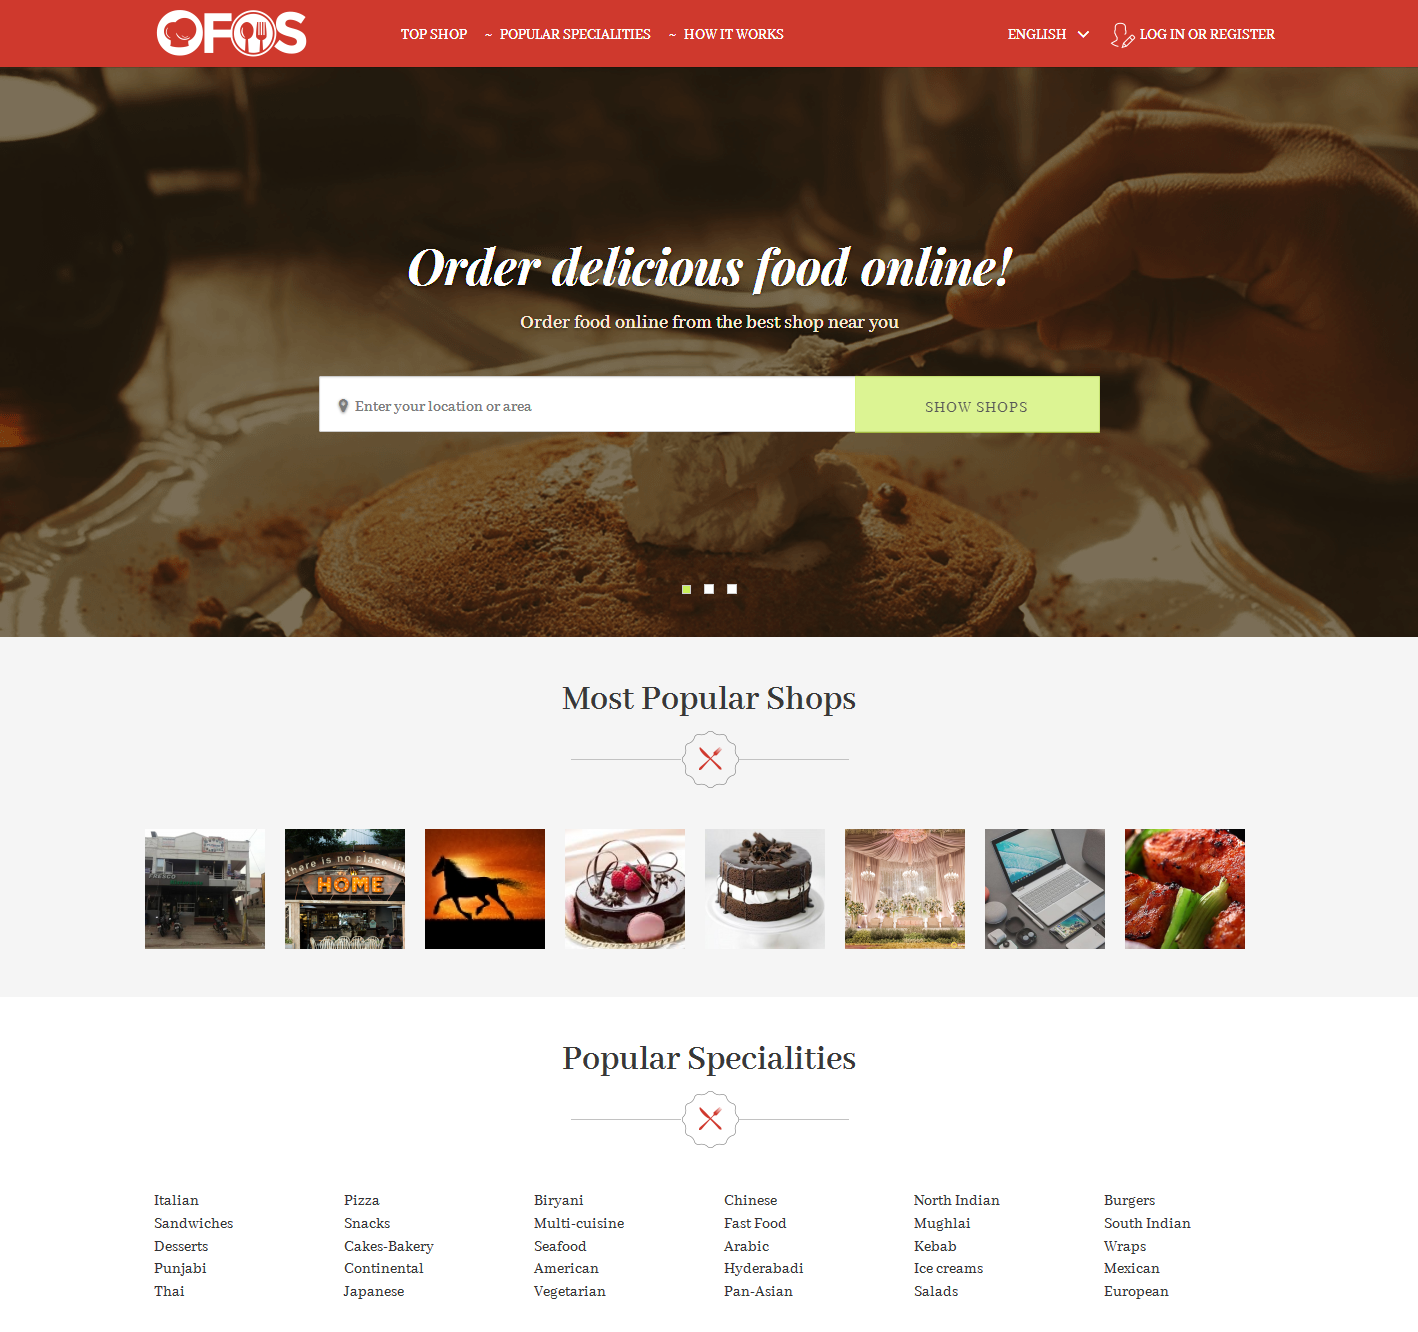 GitHub - agriya/OFOS: OFOS is an open source Online Food